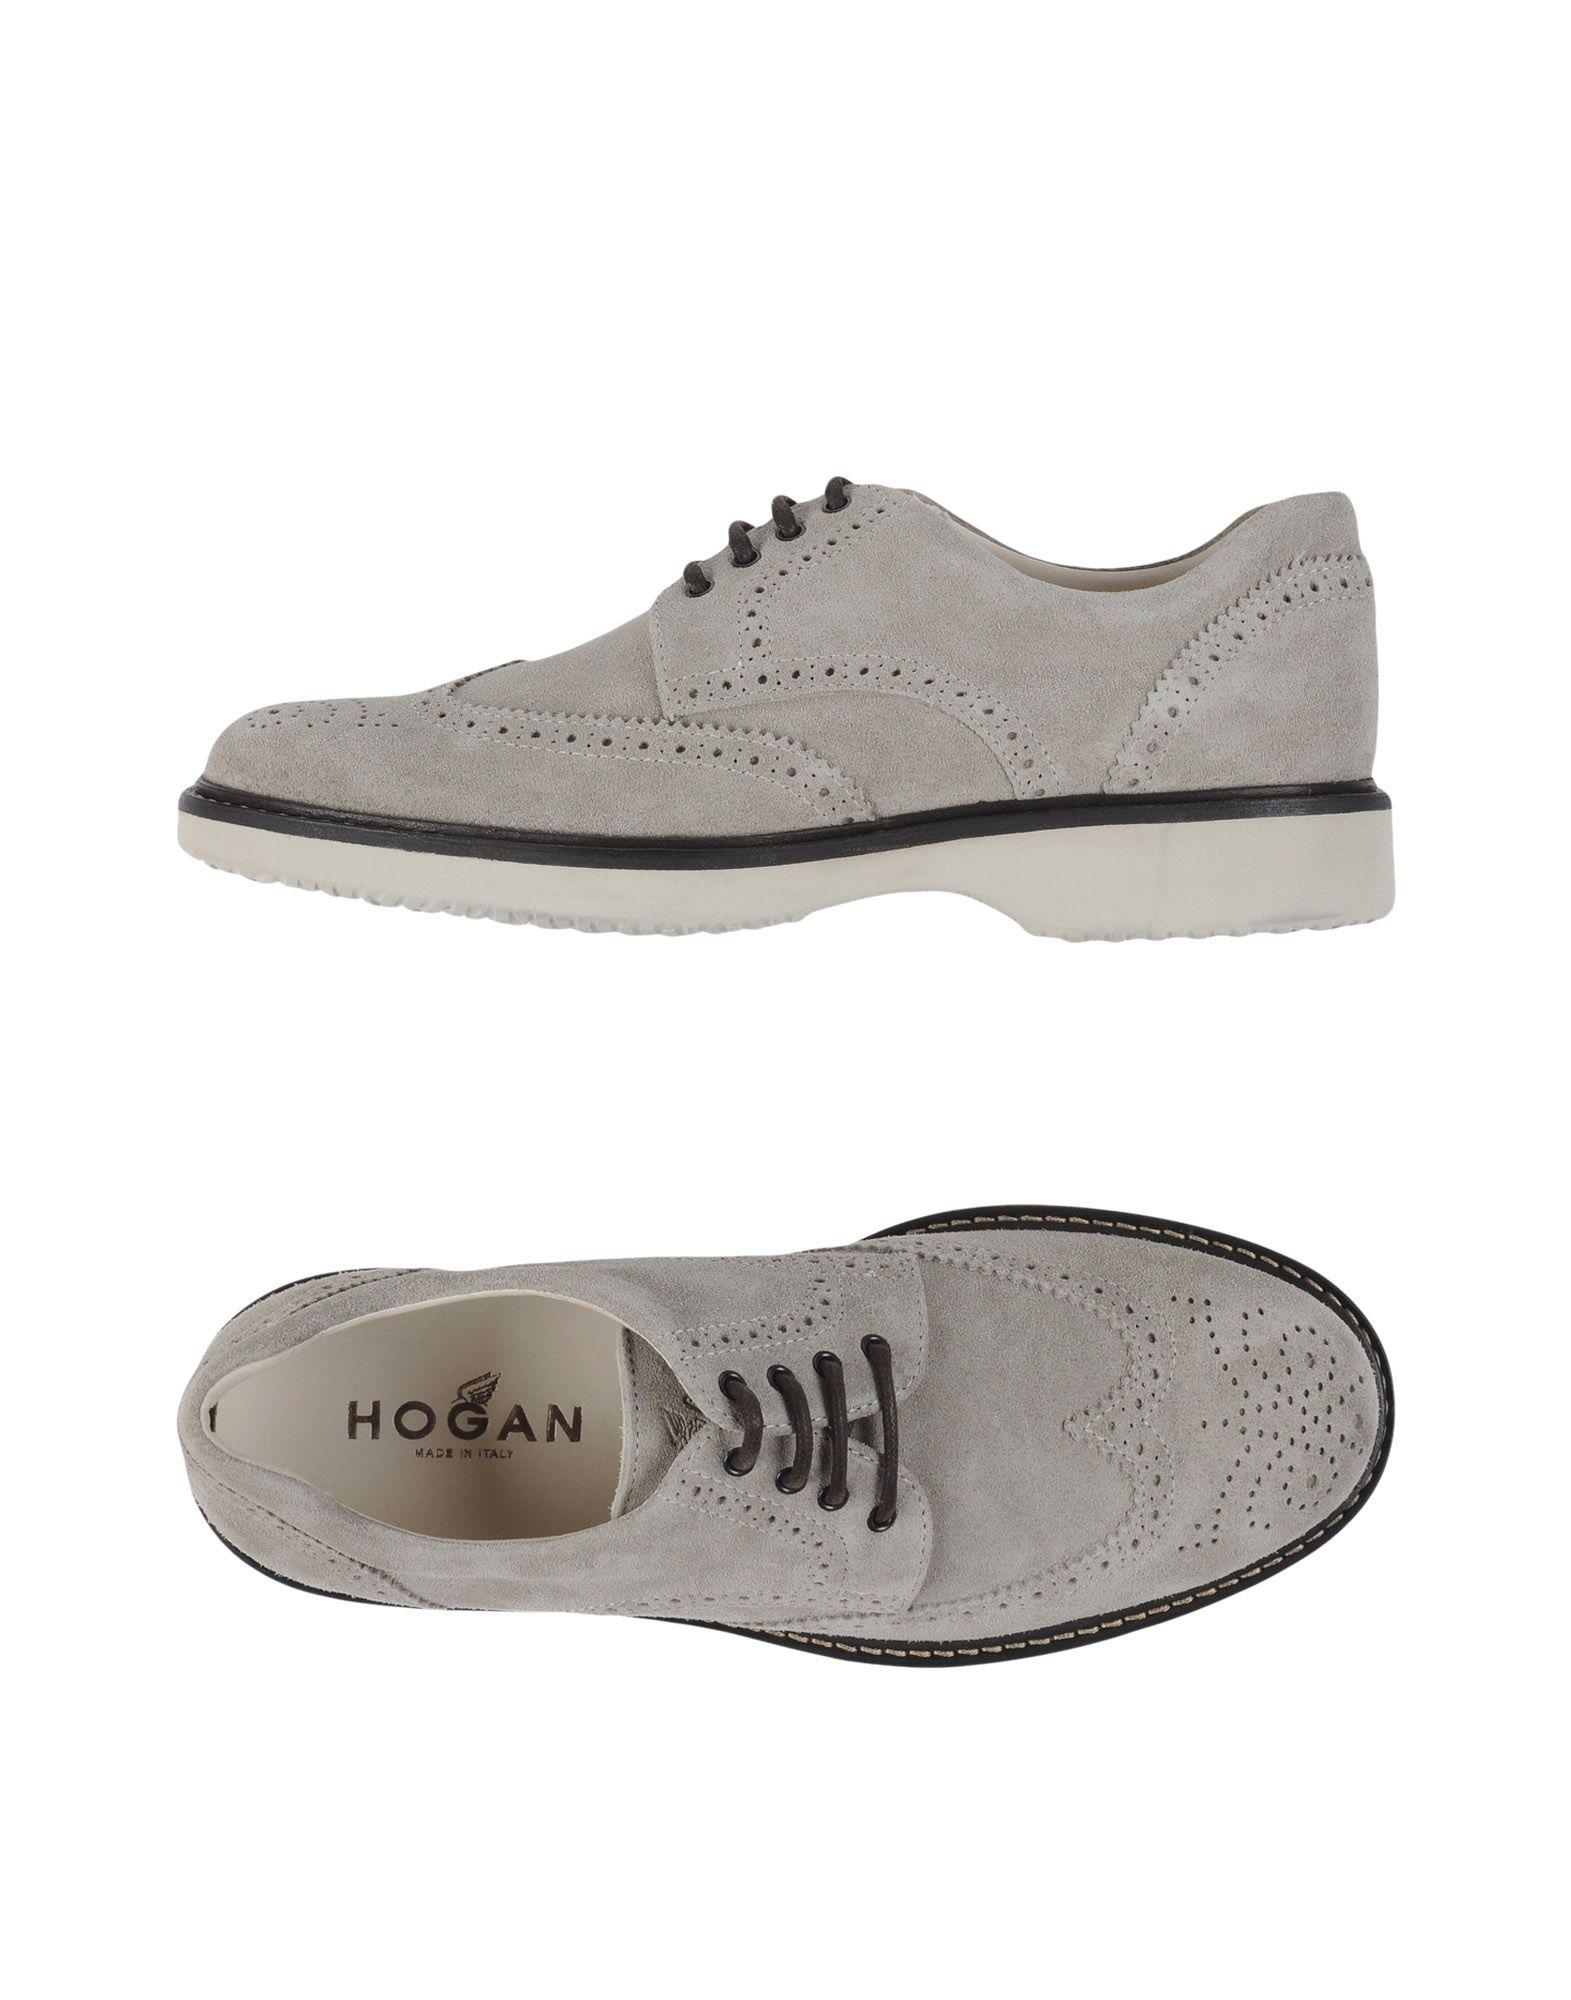 Hogan Gute Schnürschuhe Herren  11176862QM Gute Hogan Qualität beliebte Schuhe 31db50